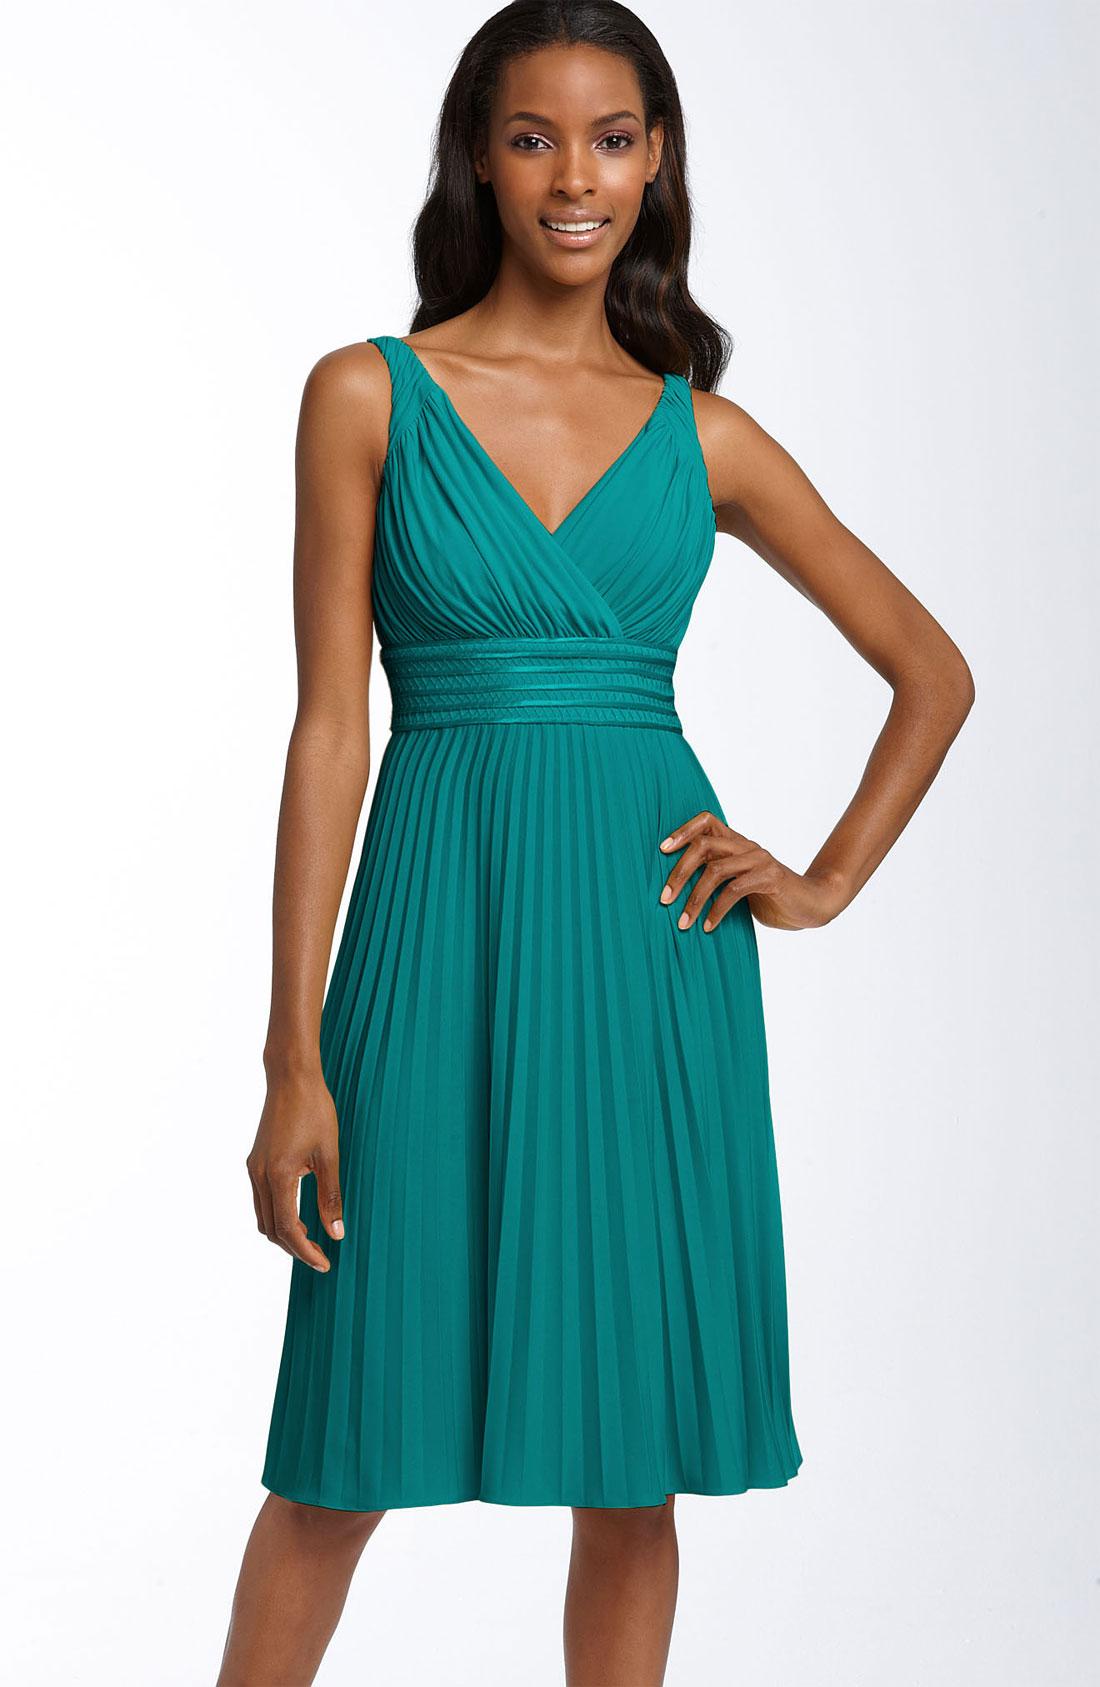 Funky Nordstroms Bridesmaid Dresses Pattern - All Wedding Dresses ...